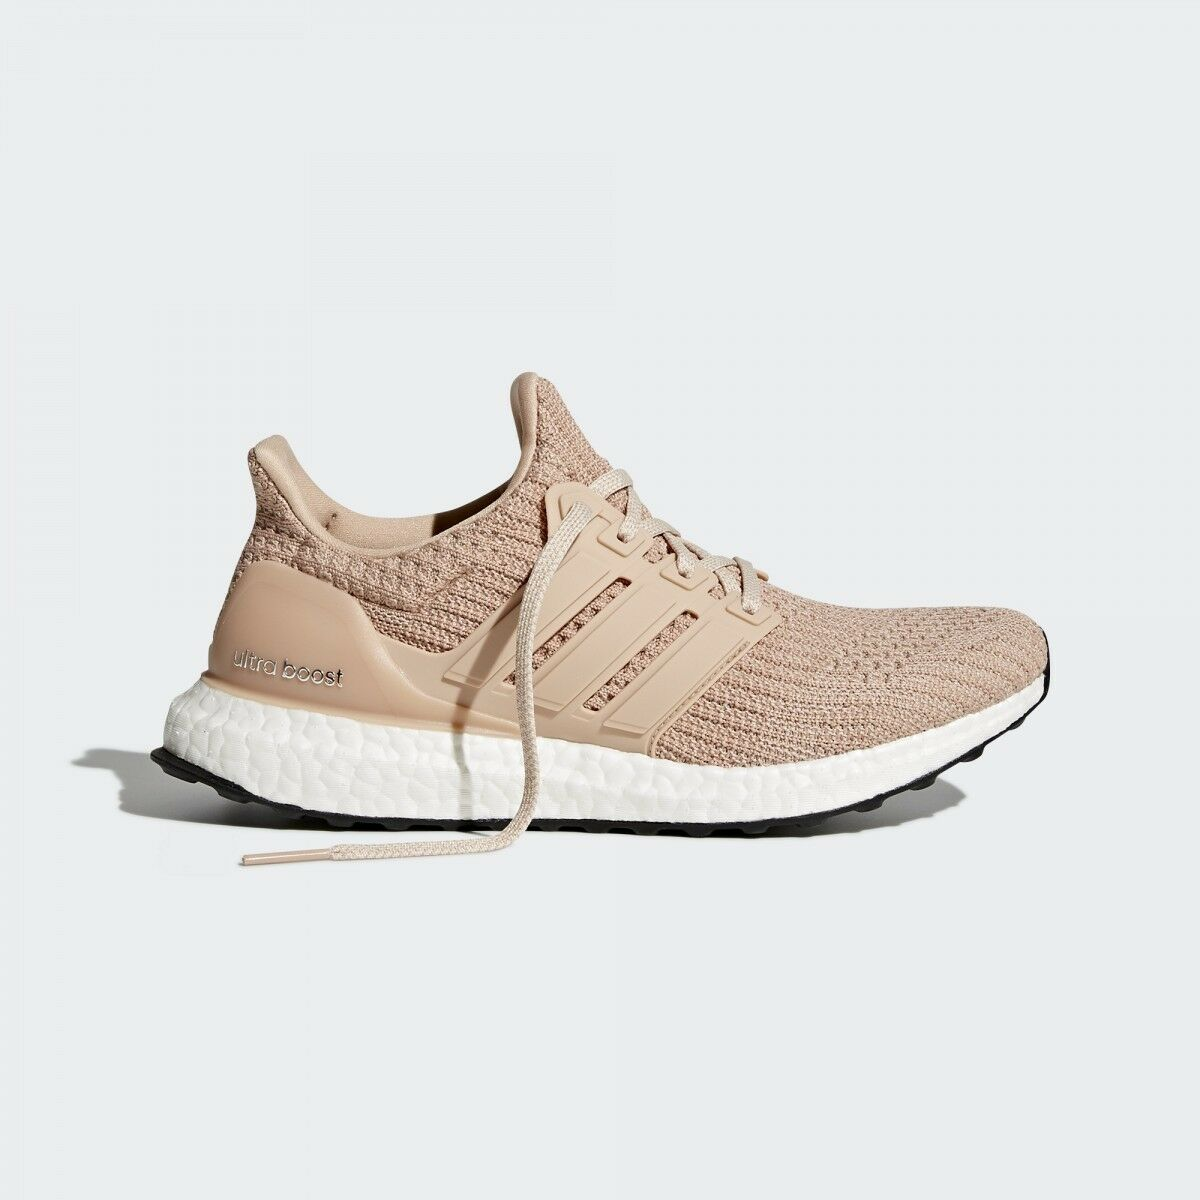 0c53da973 NEW Adidas Ultra Boost 4.0 Women s Running shoes Ash Pearl Pink Pk Retro  BB6309